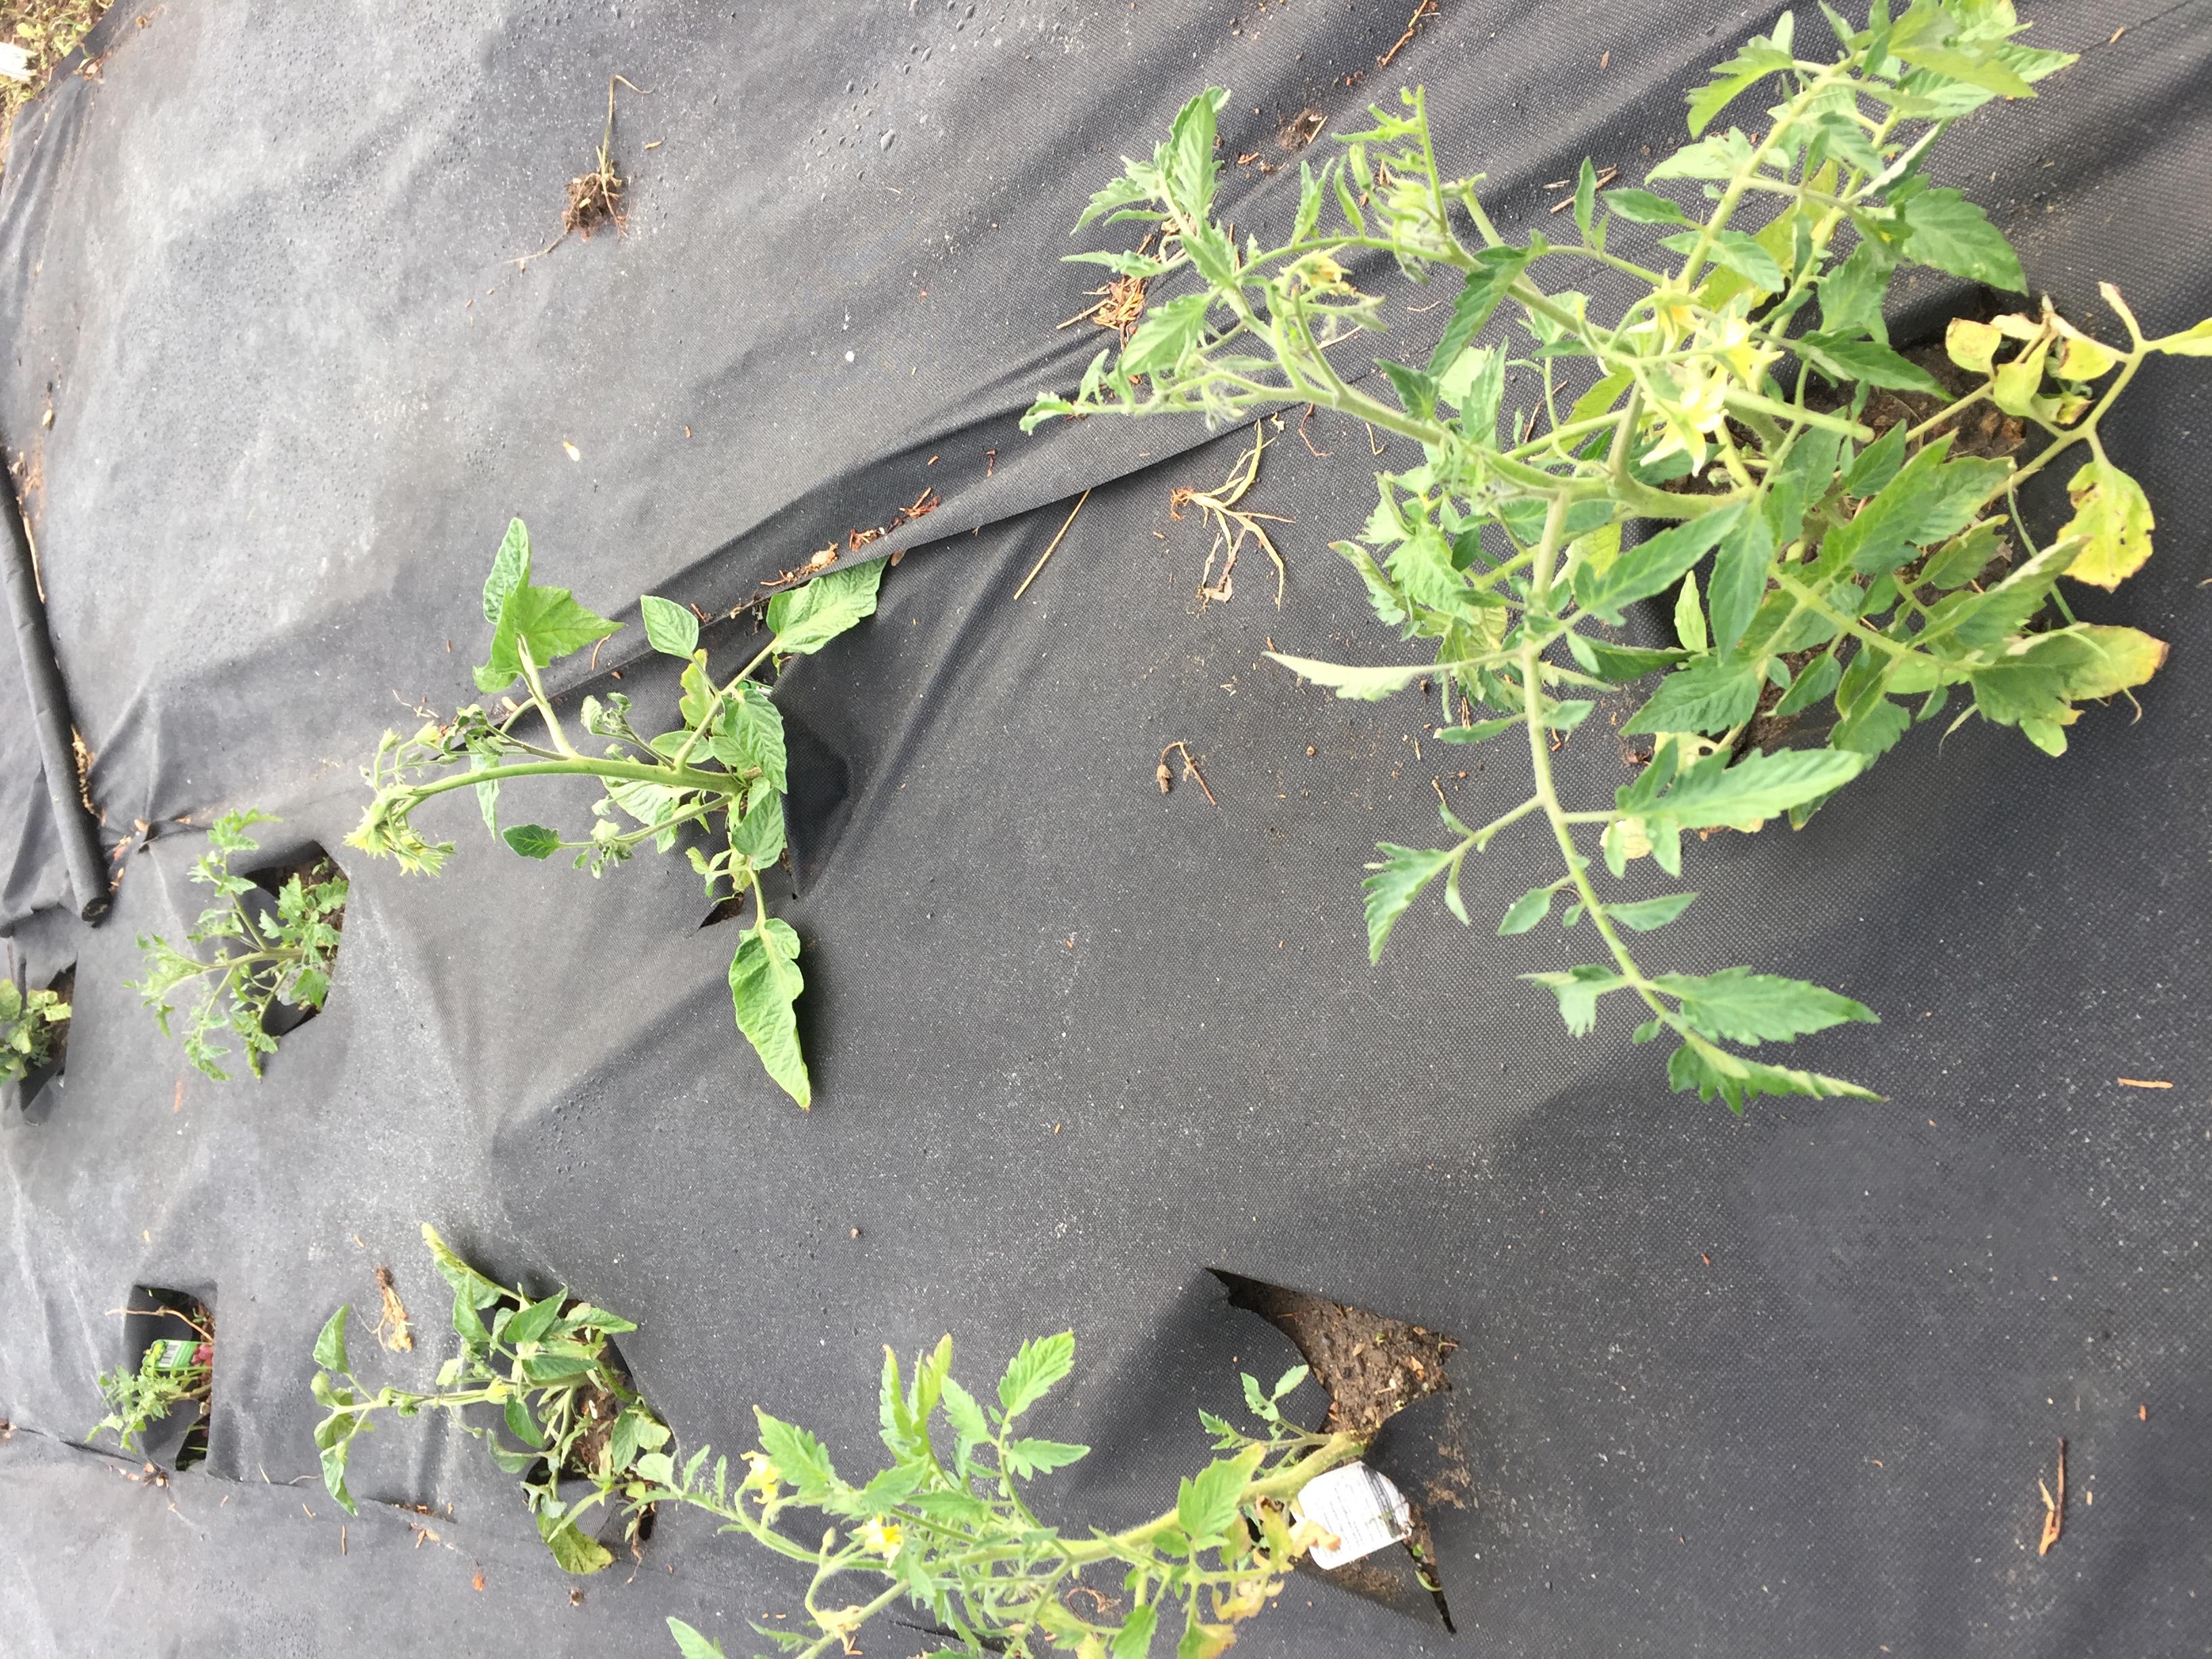 758E9575 EF96 416C 99F5 38CA6FA2A3E9 Irises, Roses, and Azaleas — Oh My!